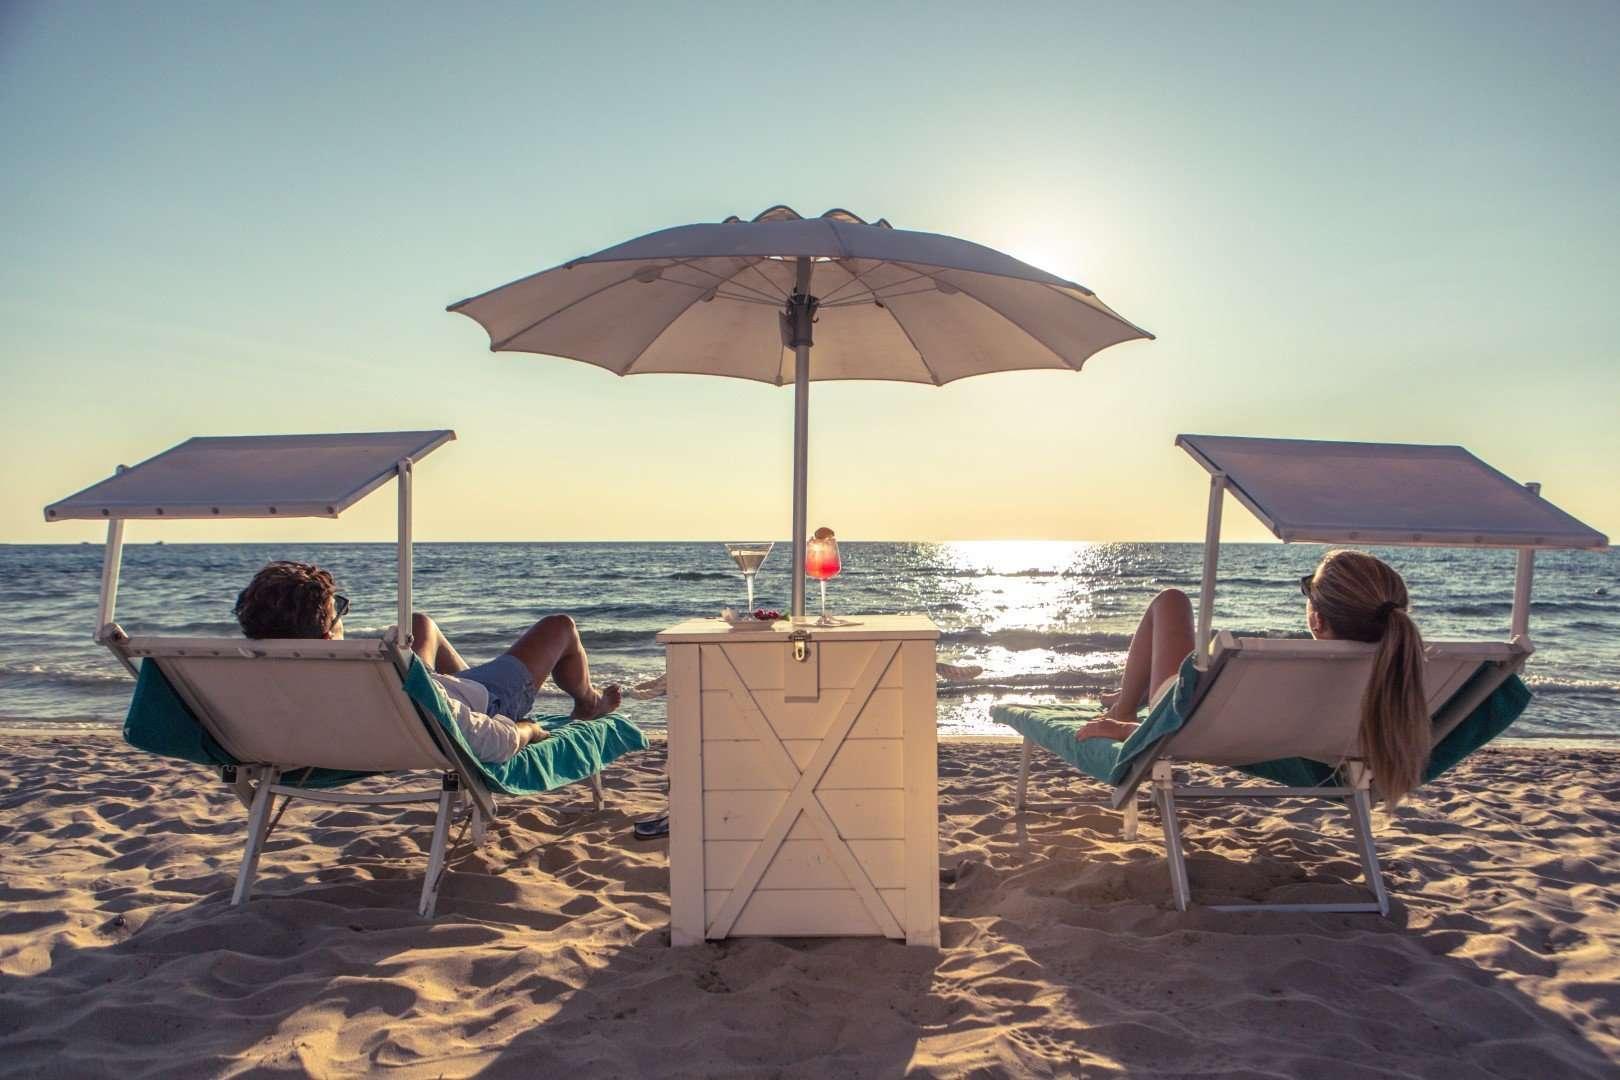 hotel costa brada - gallipoli - puglia - italie -parasols op strand